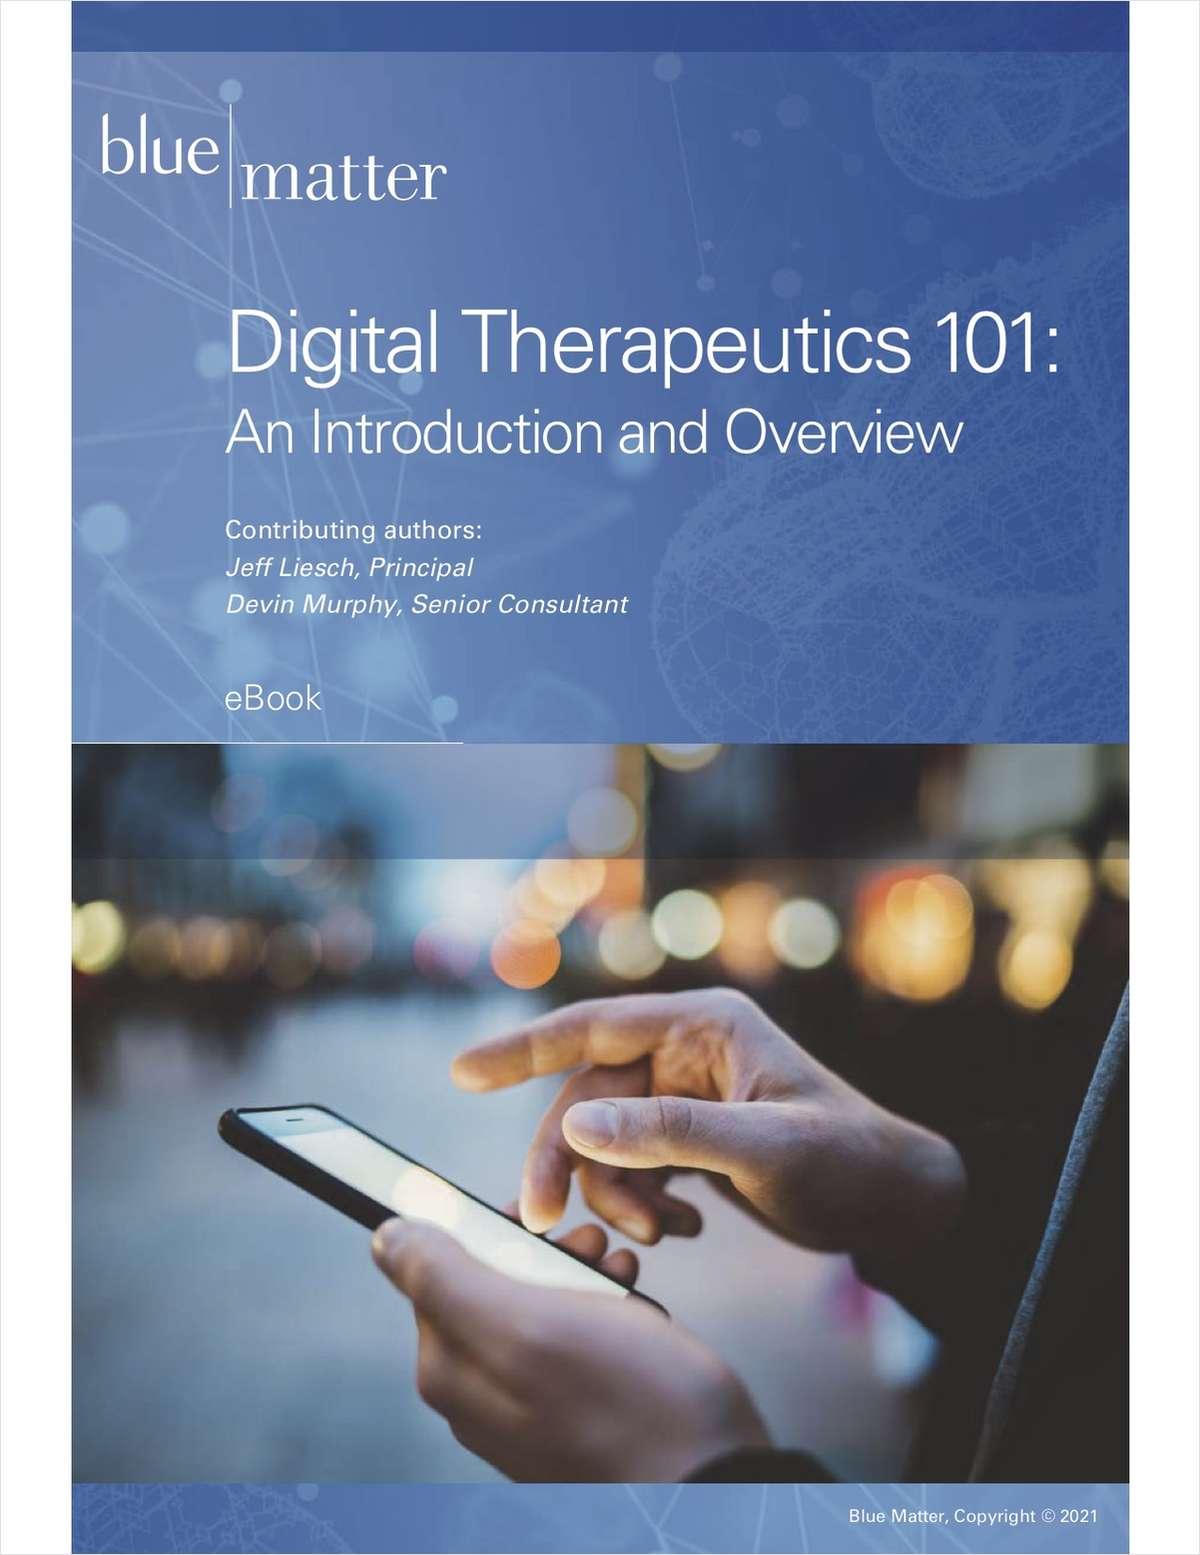 Digital Therapeutics 101